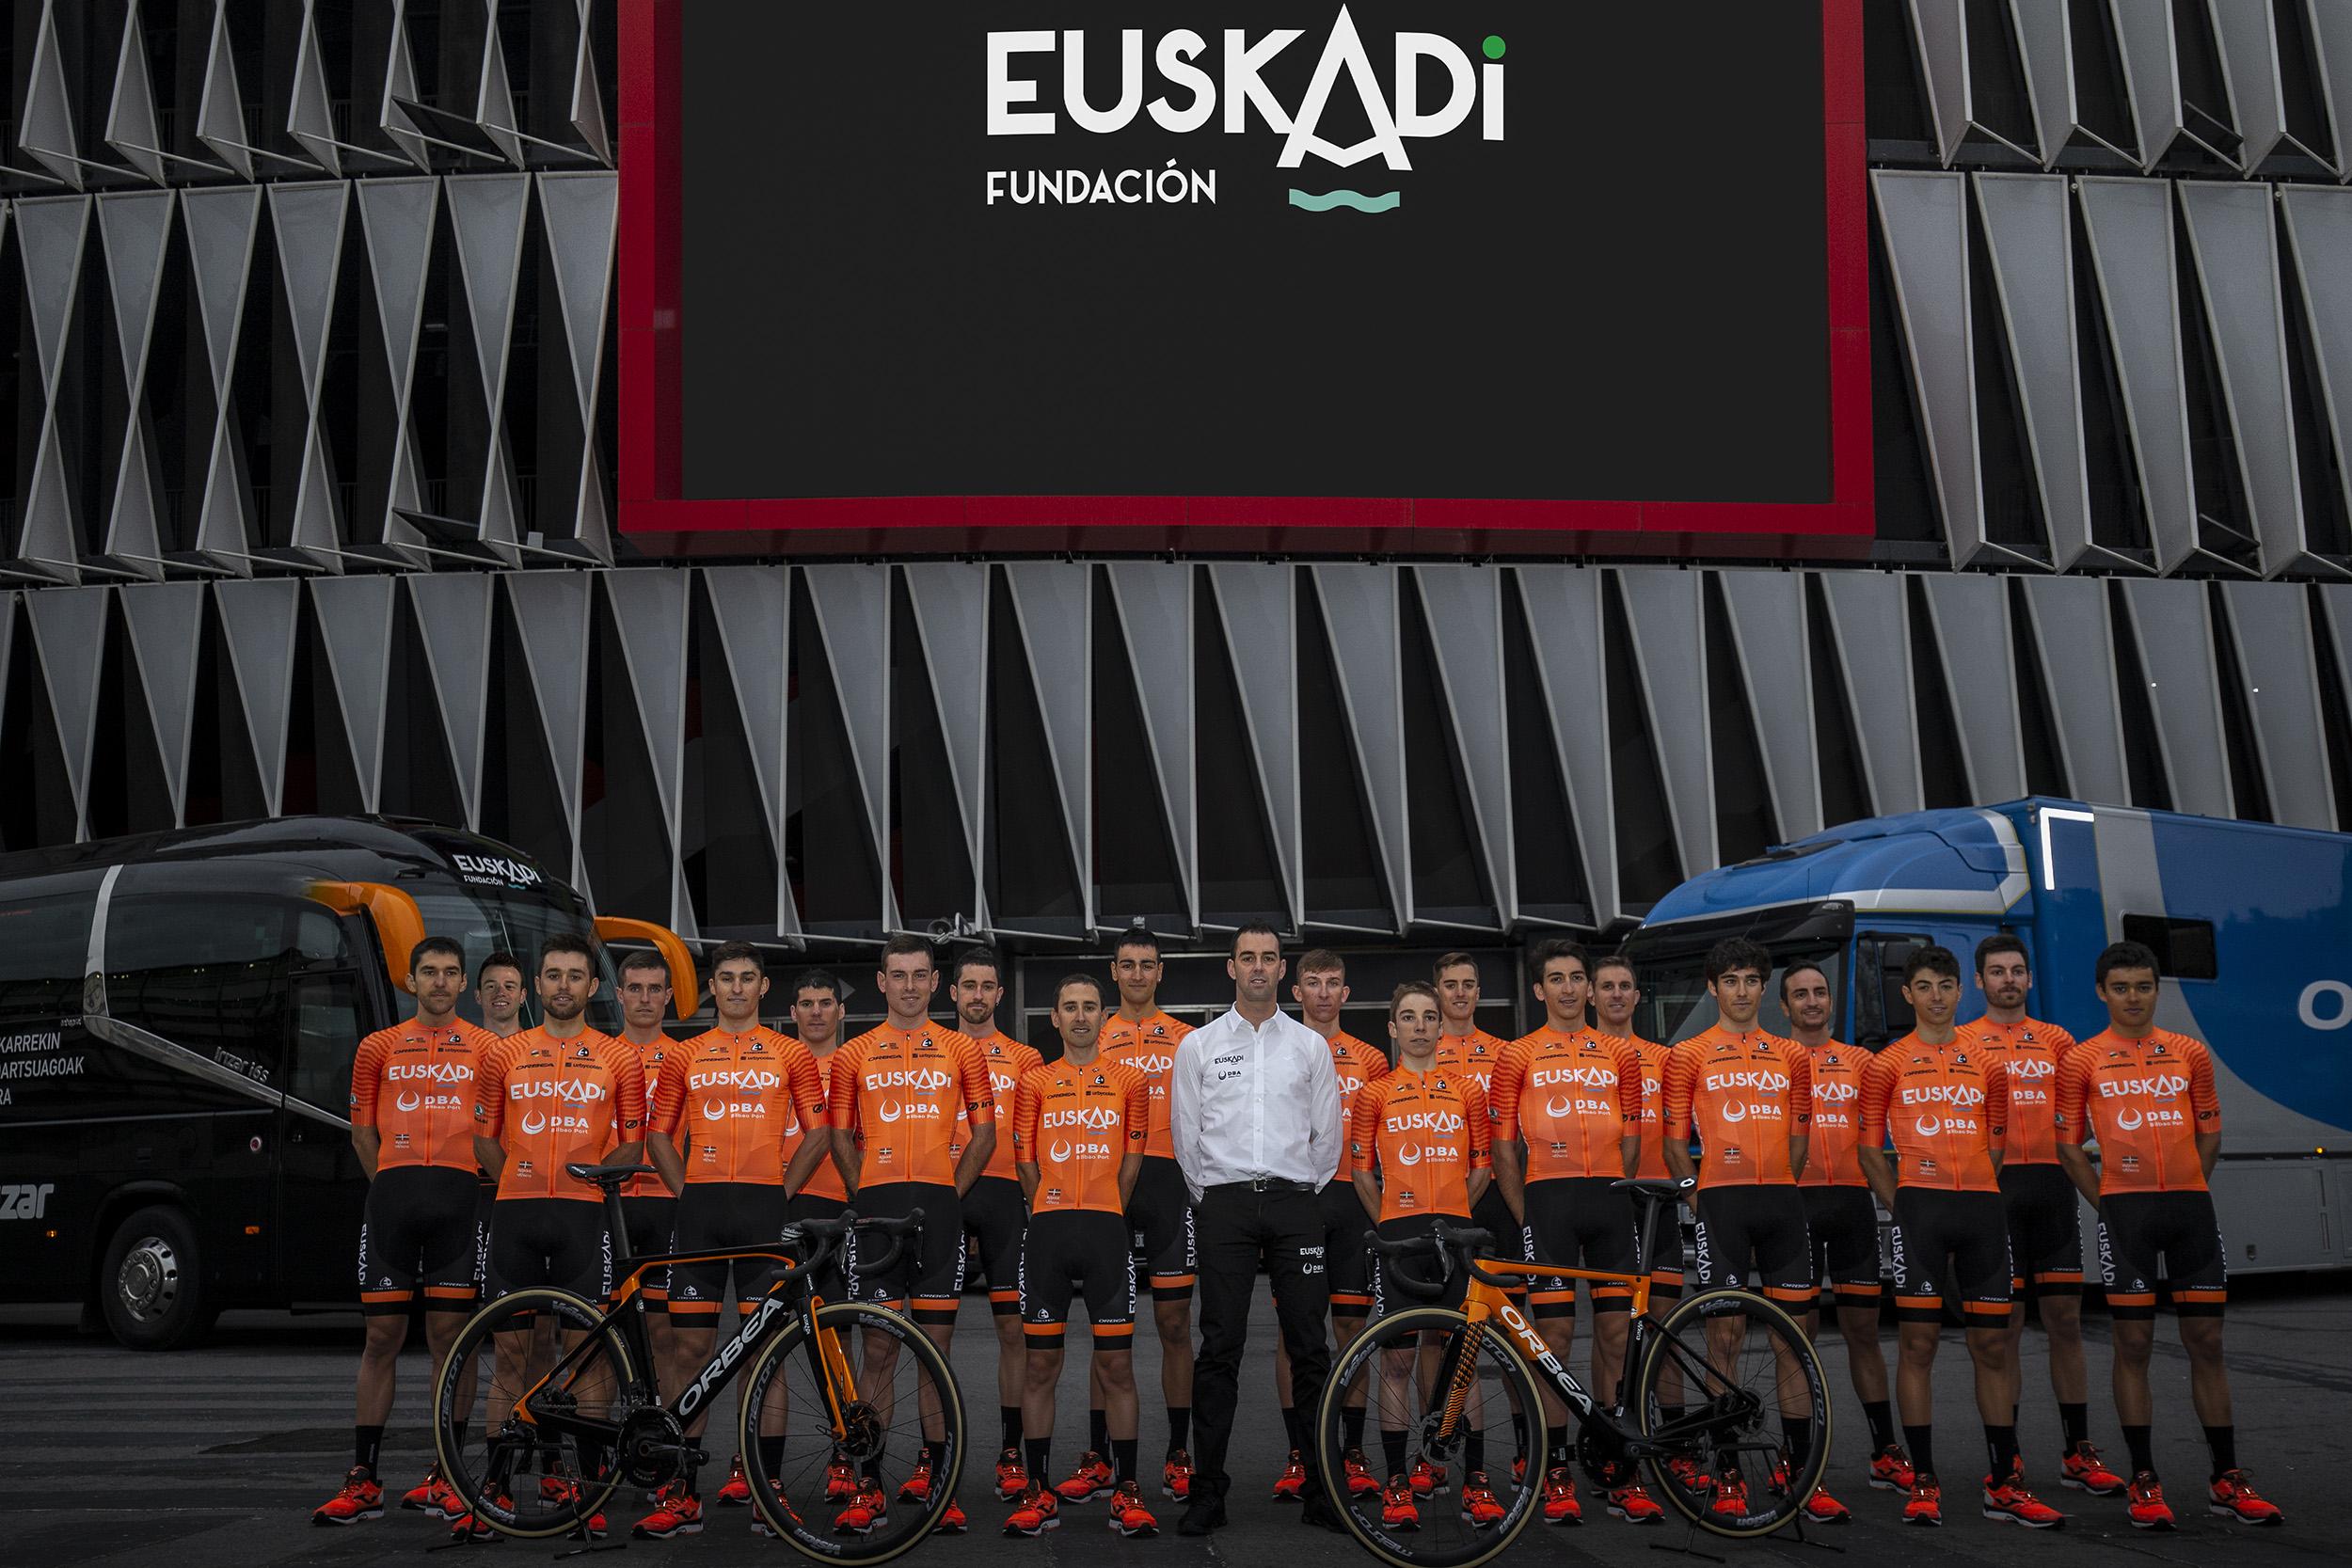 laguiadelciclismo.com/wp-content/uploads/2019/11/Fundaci%C3%B3n_Euskadi_2020_Plantilla.jpg